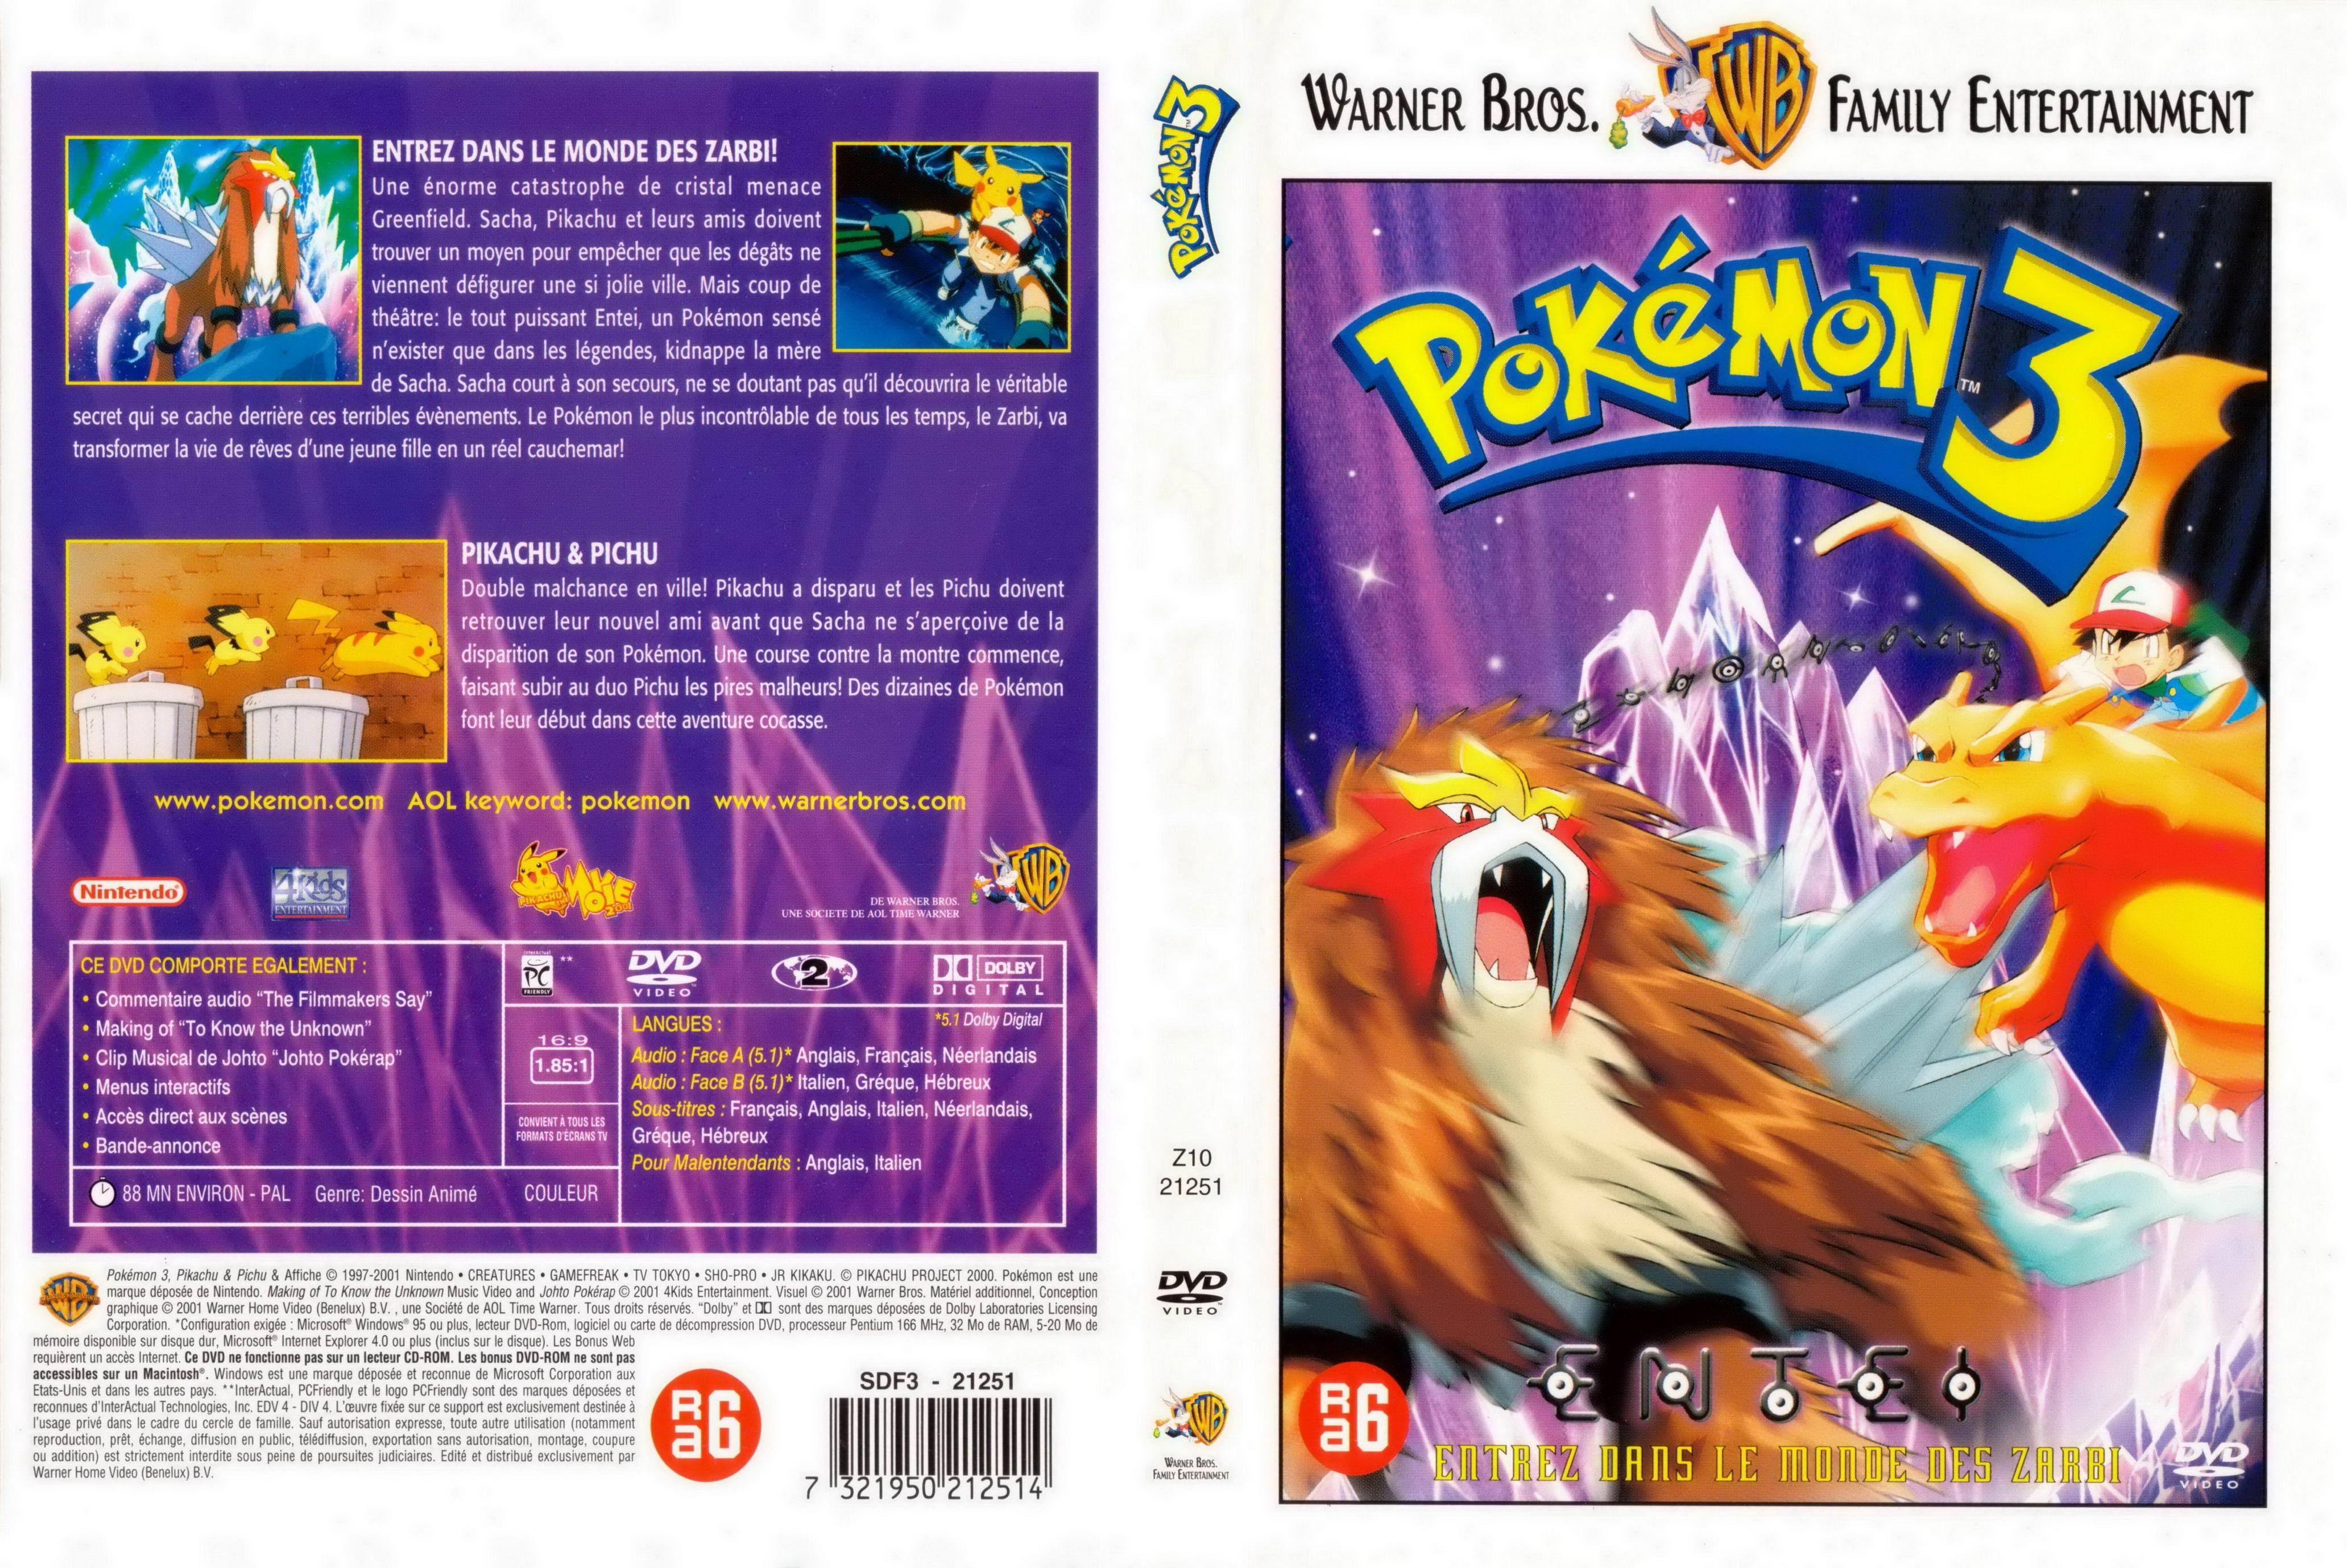 Pokémon Pokemon 3 Minitokyo